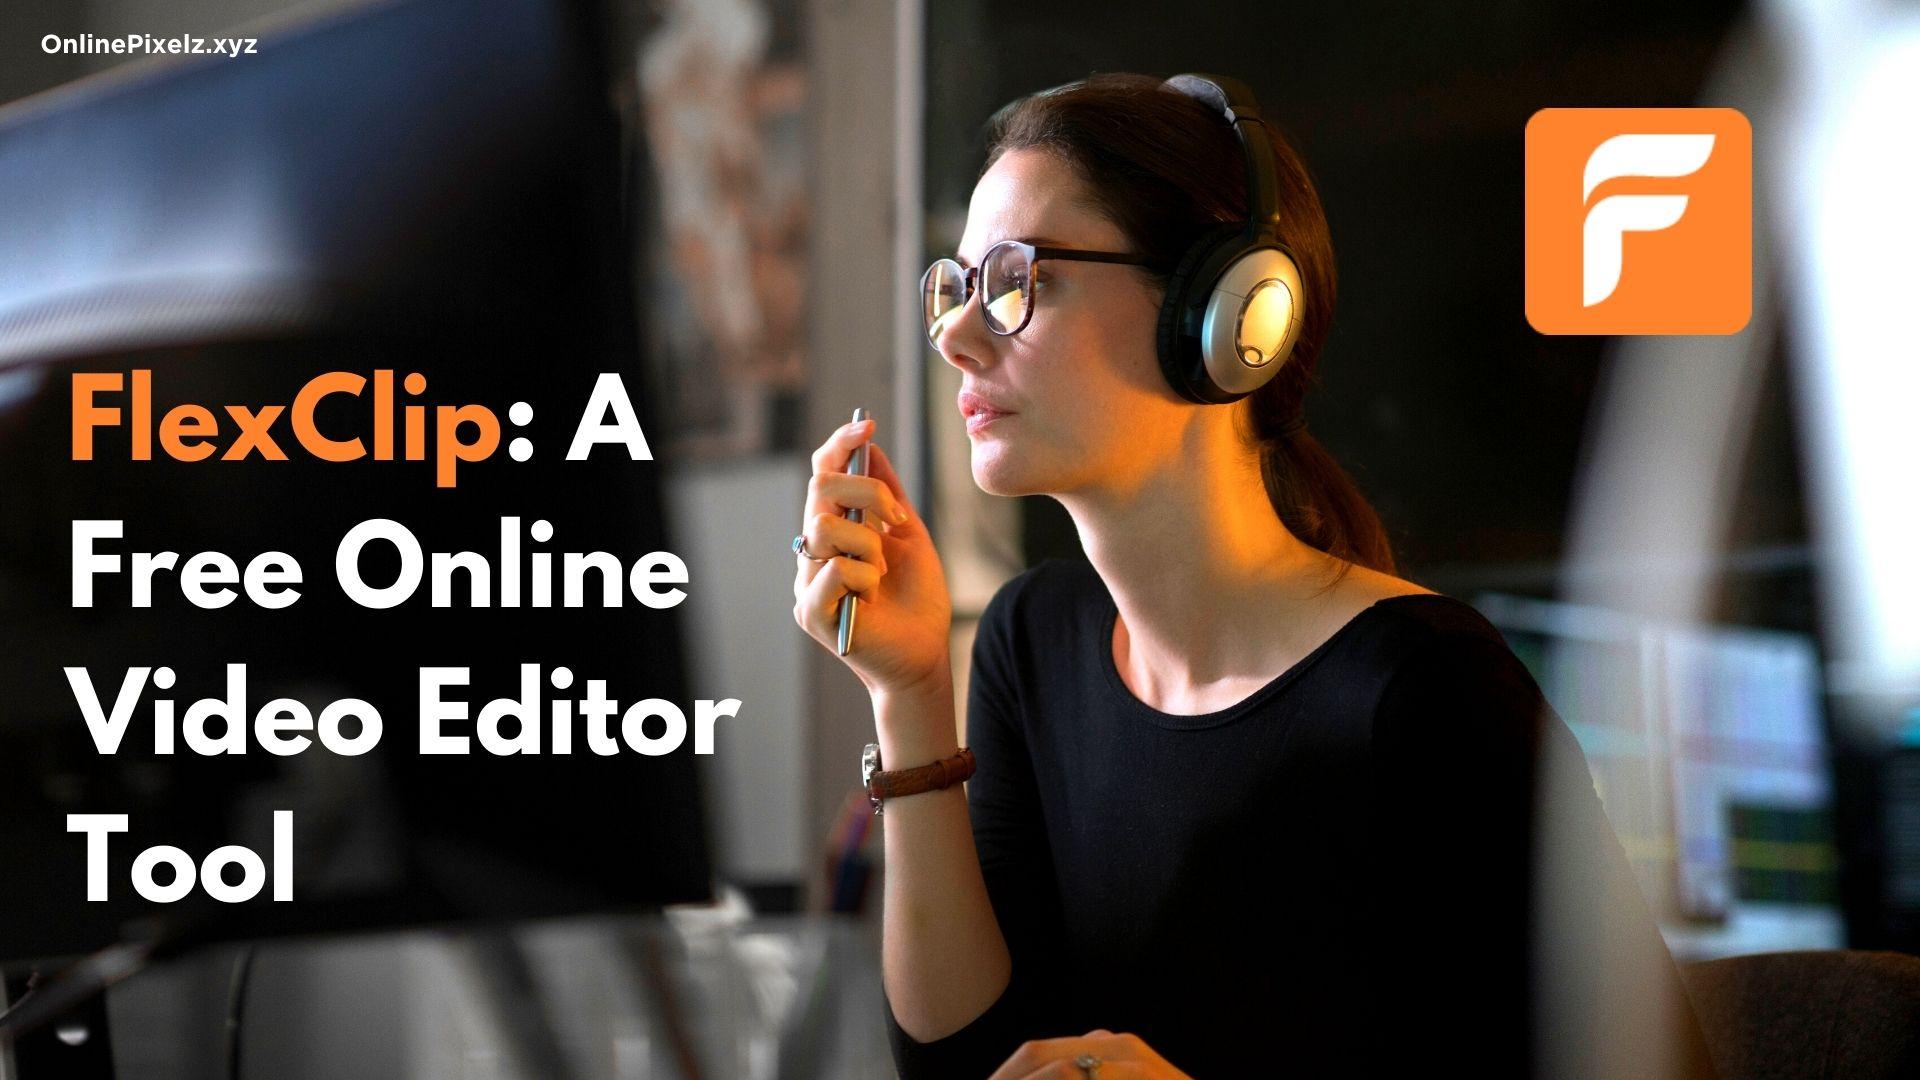 FlexClip: A Free Online Video Editor Tool